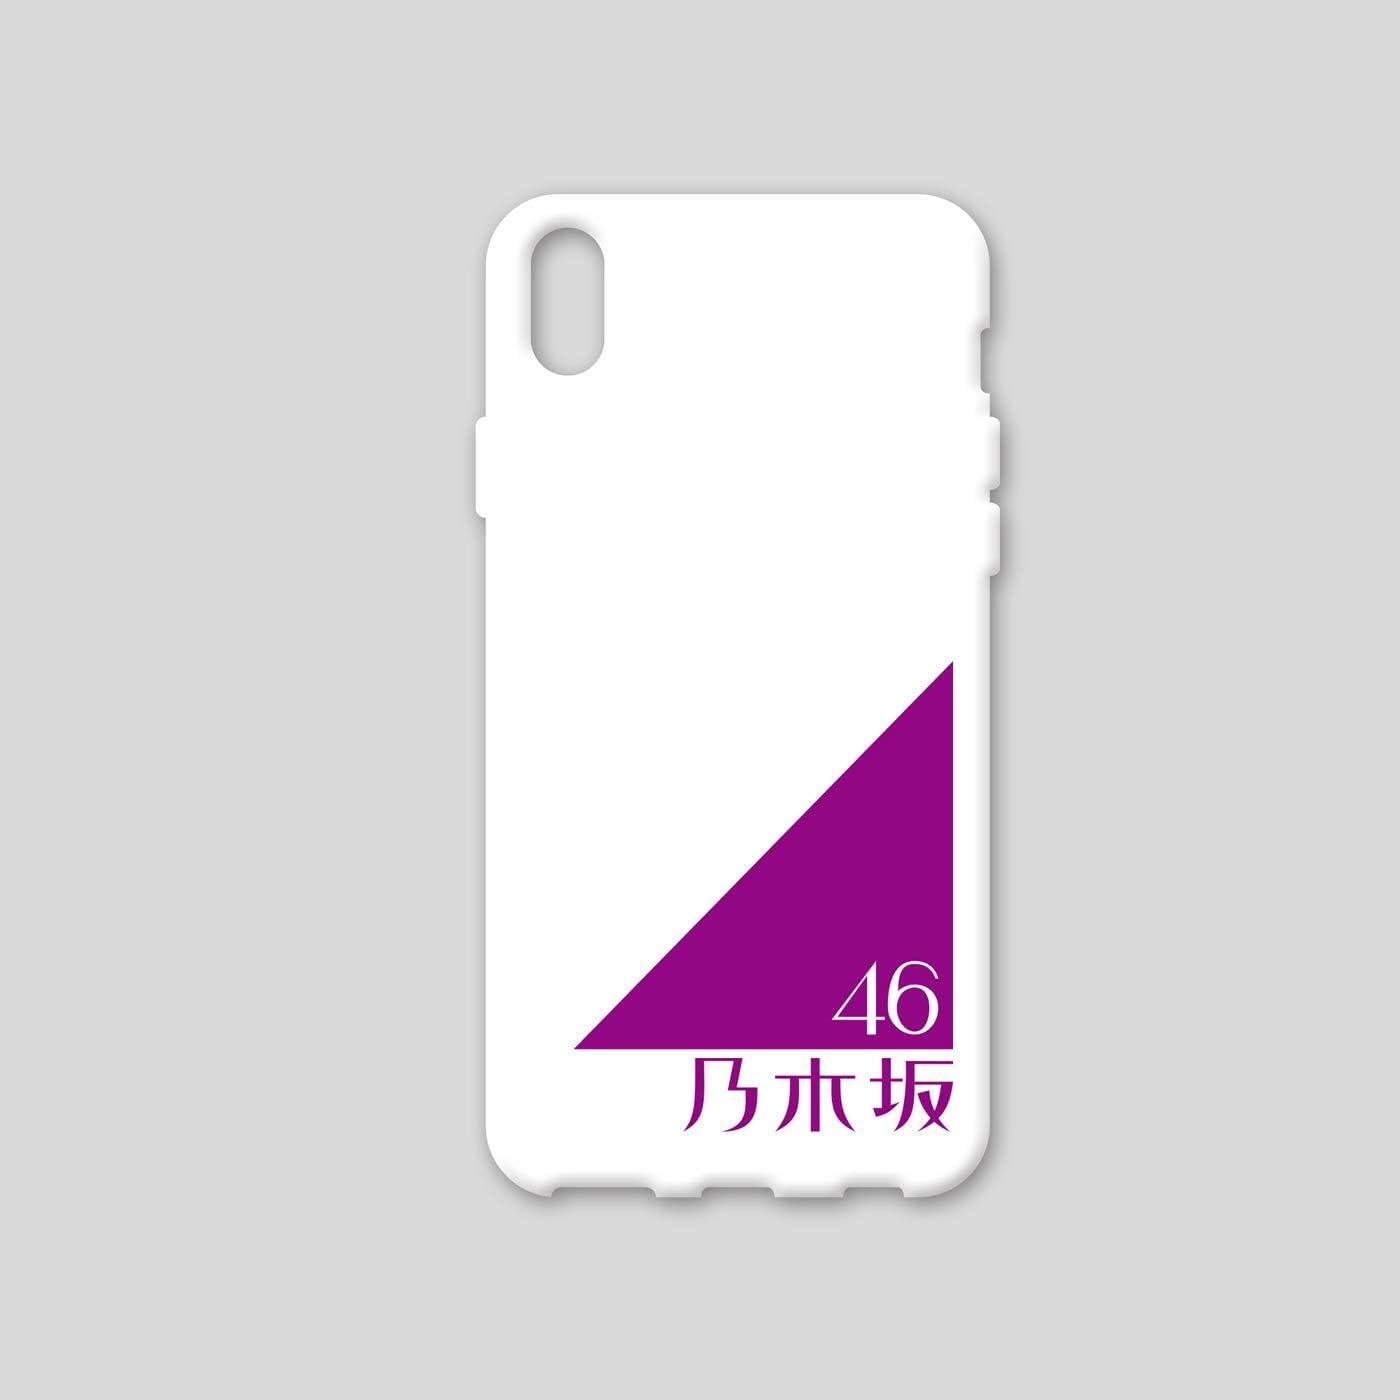 amazon co jp iphone smartphone soft tpu cover case nogizaka46 logo iphone 8 7 black hobby iphone smartphone soft tpu cover